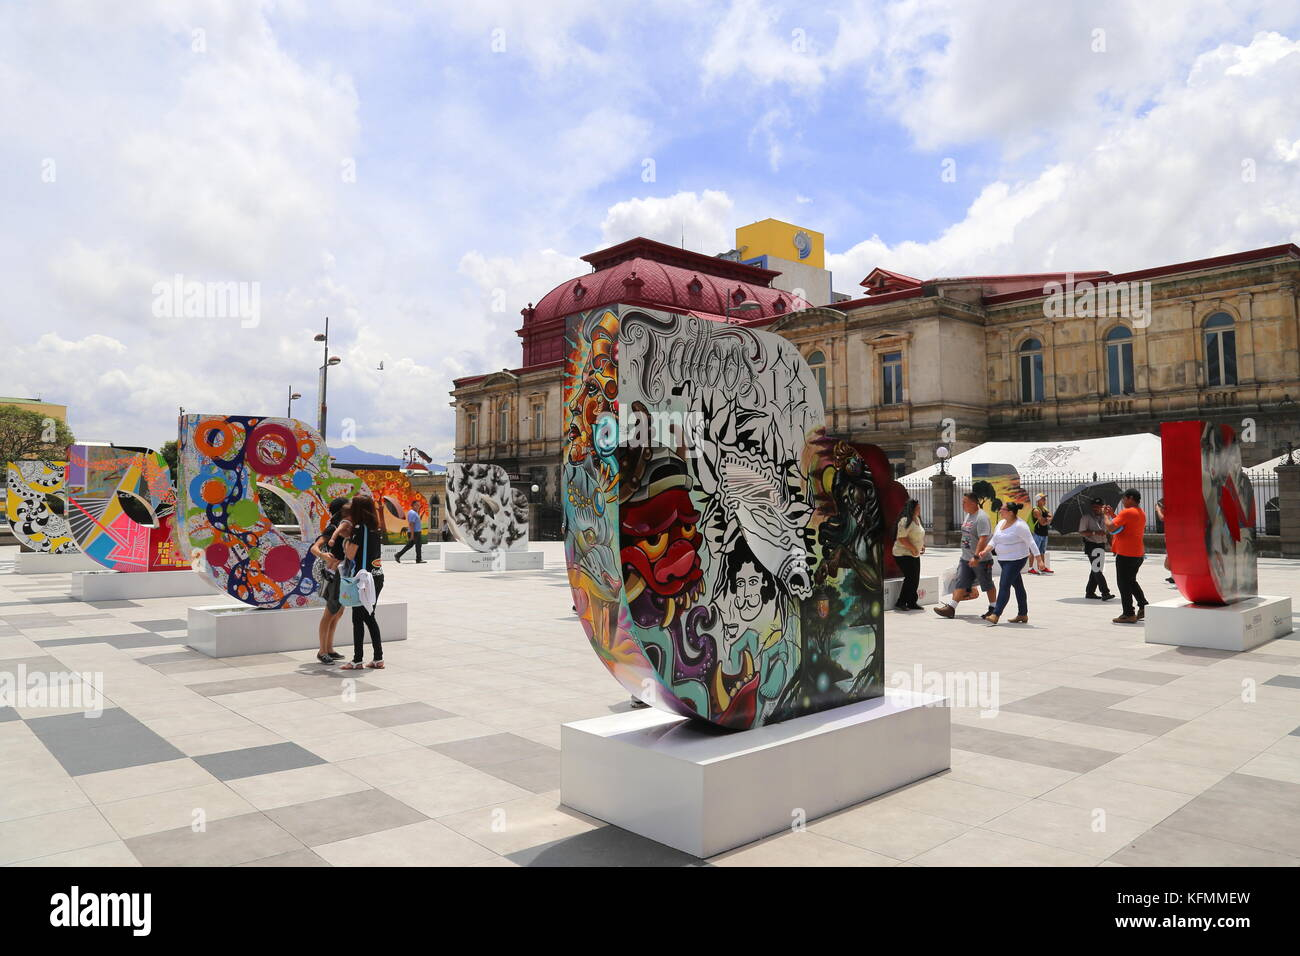 Plaza de la Cultura, Avenida Central, San José, San José provincia, Highlands Centrali, Costa Rica, America Immagini Stock